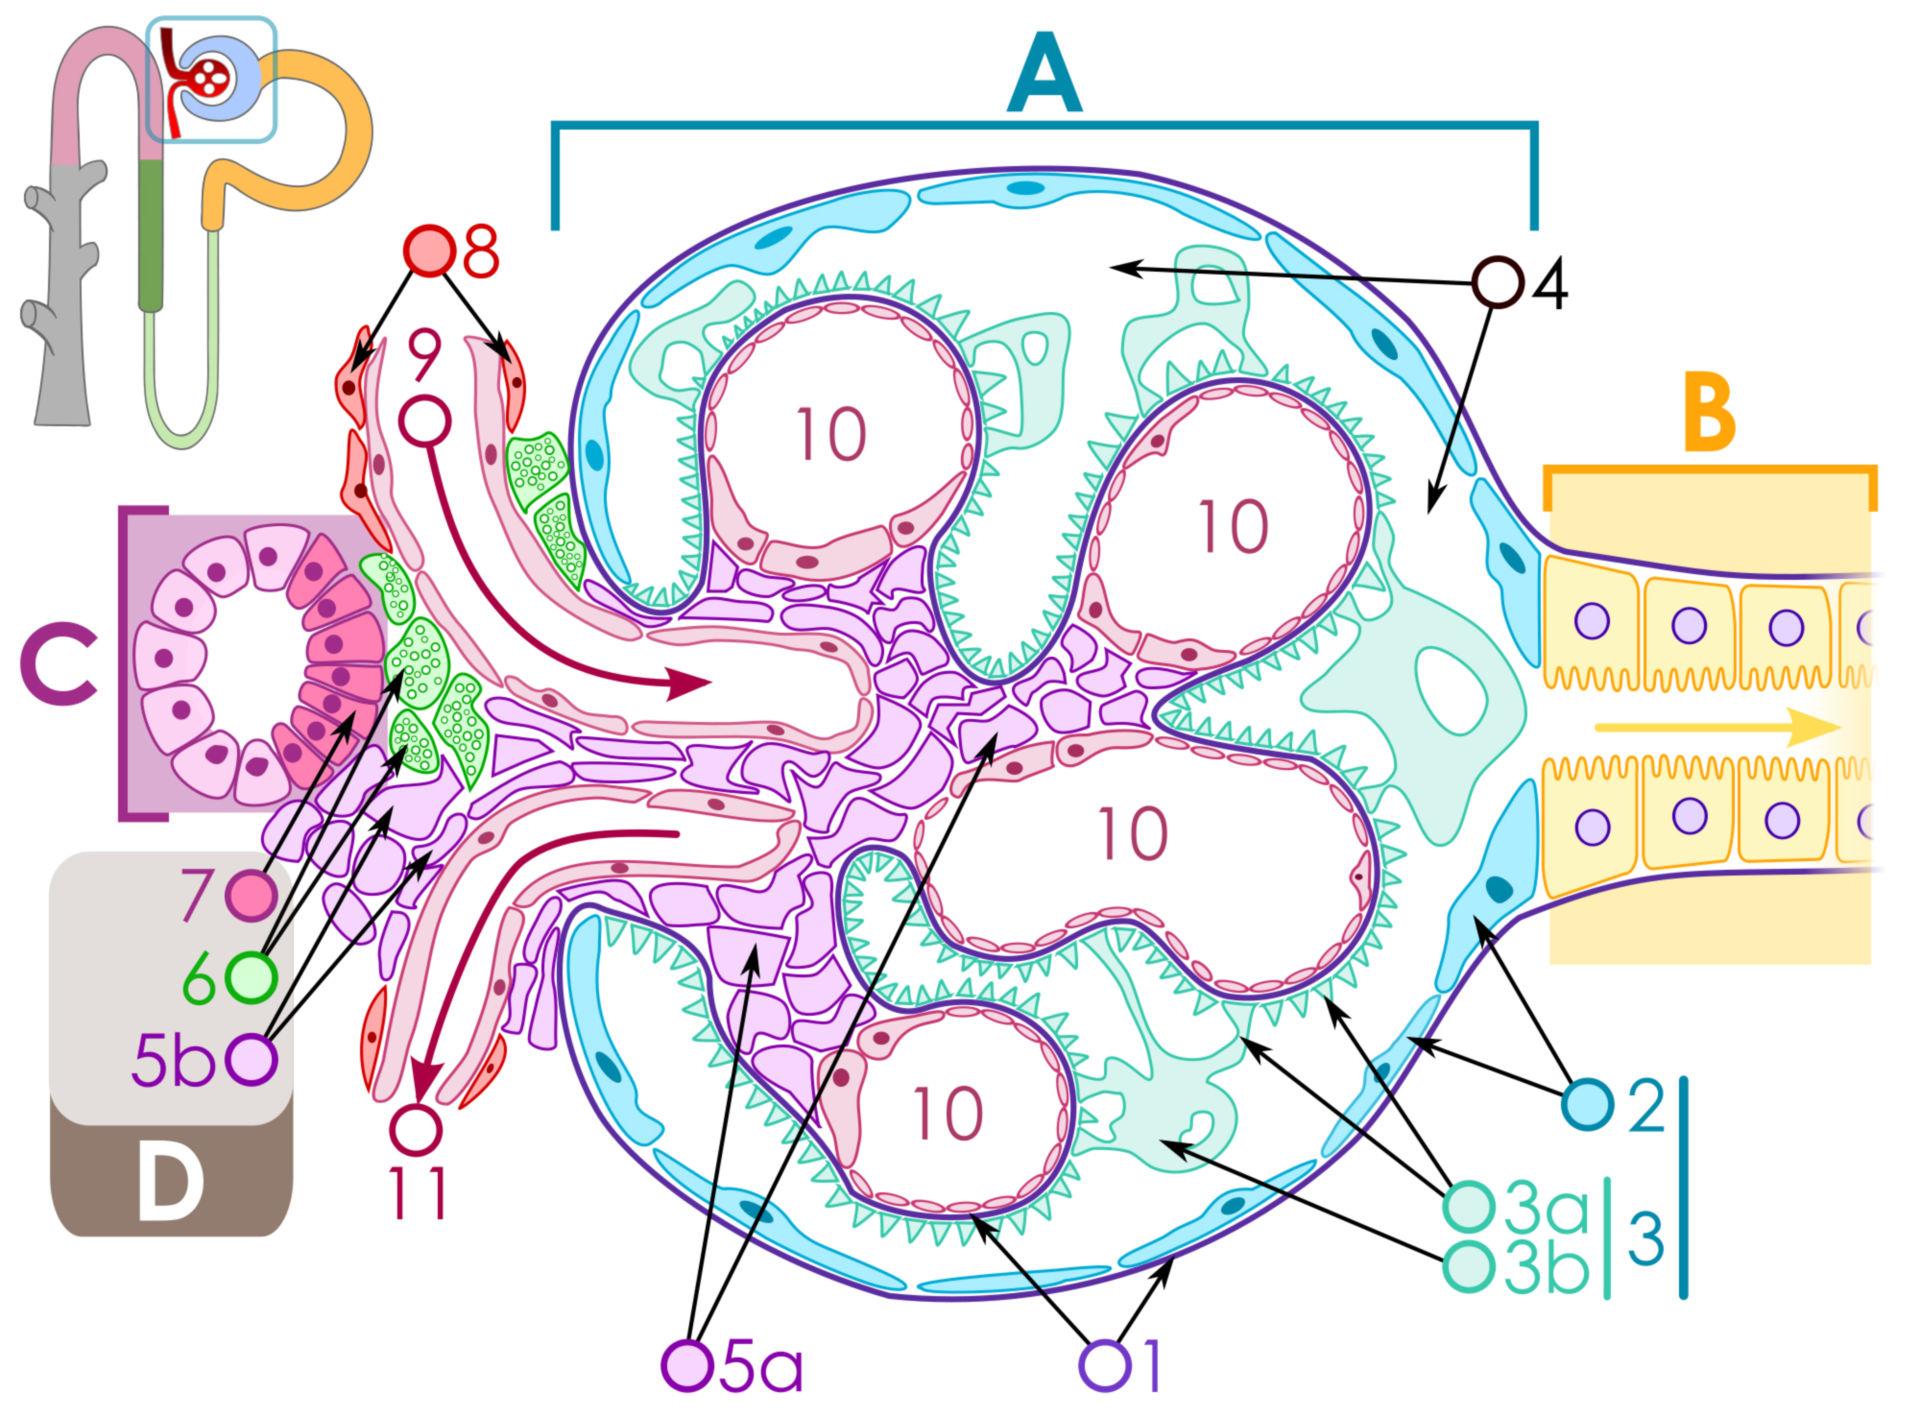 Structure of the glomerulus (scheme)